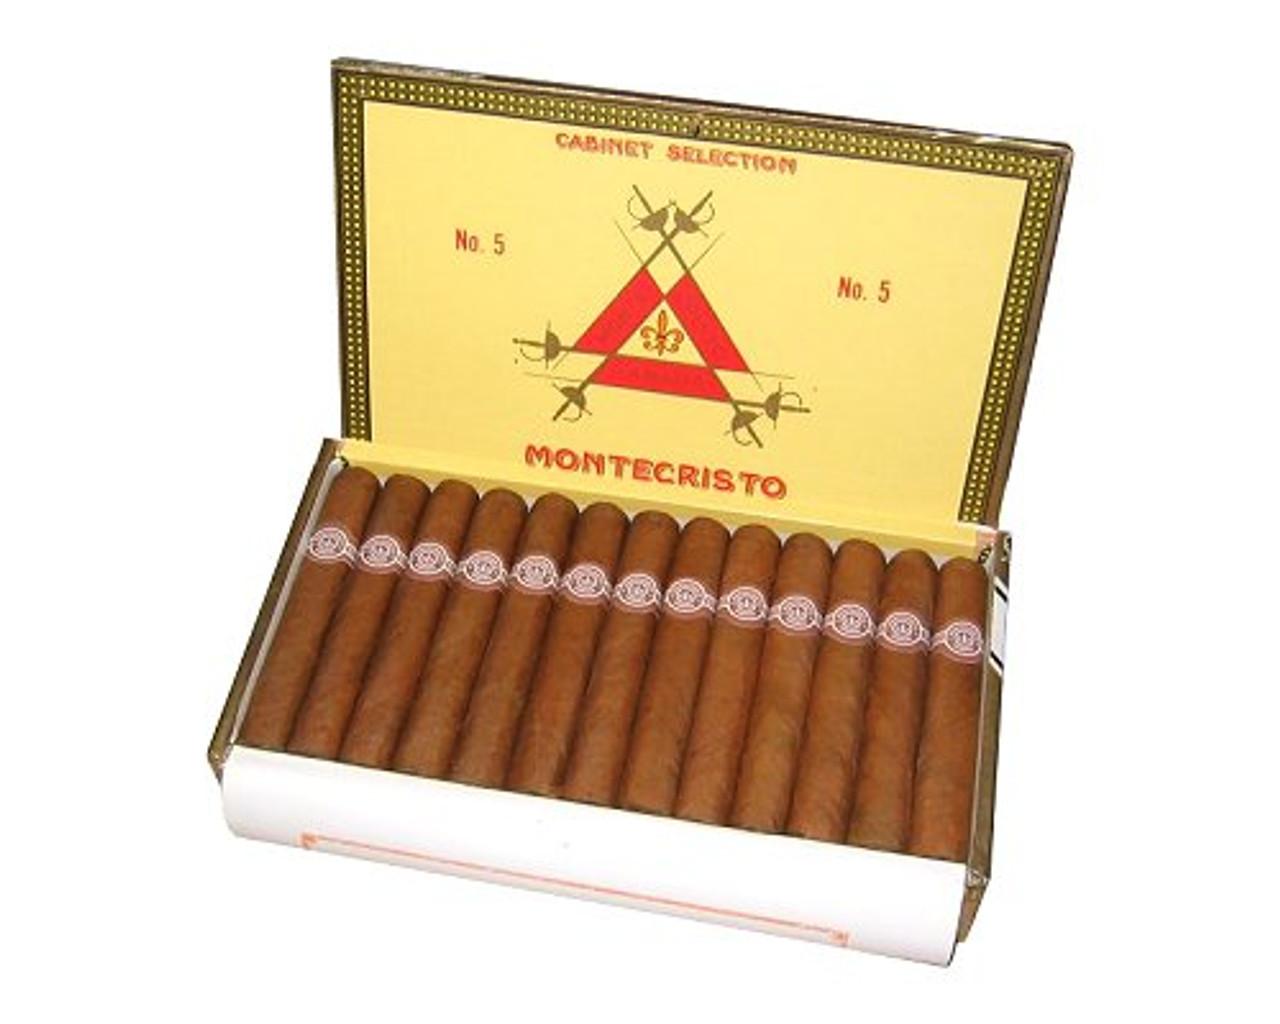 Montecristo No. 5 - Box of 25